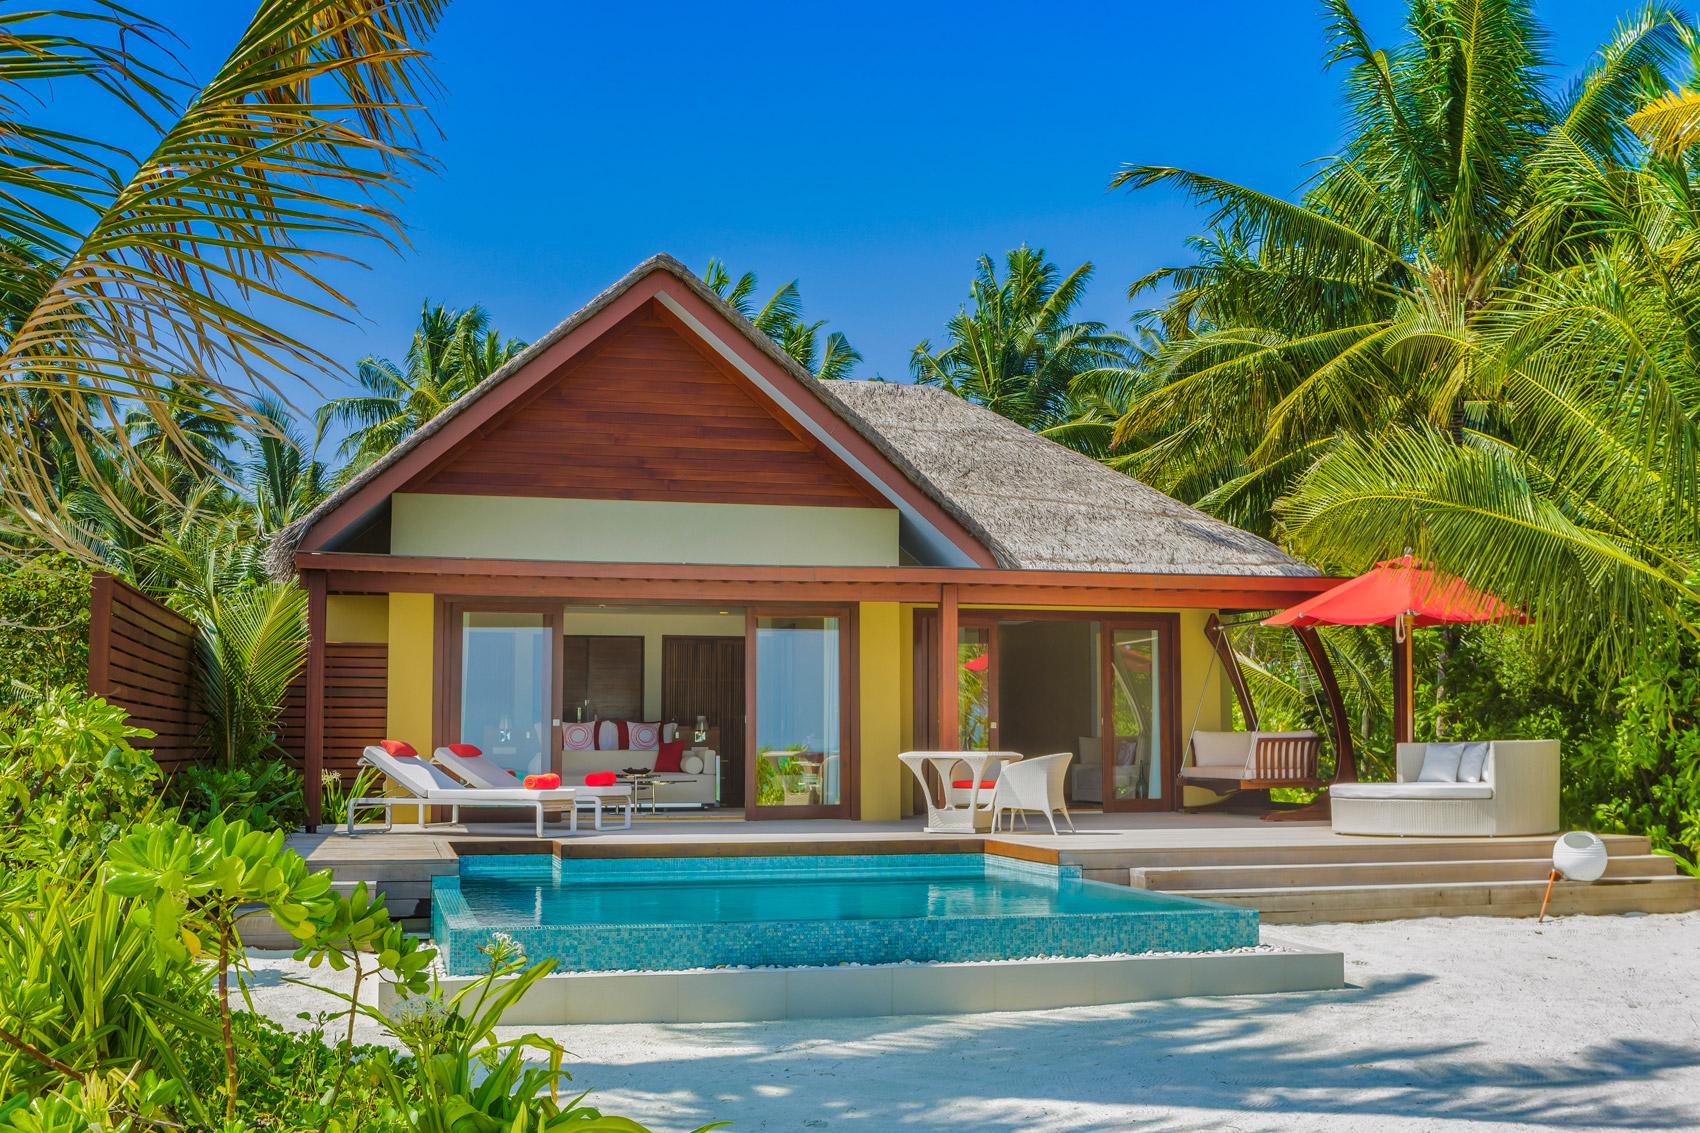 Spotlight On The Maldives - The Luxurious Niyama Experience 6